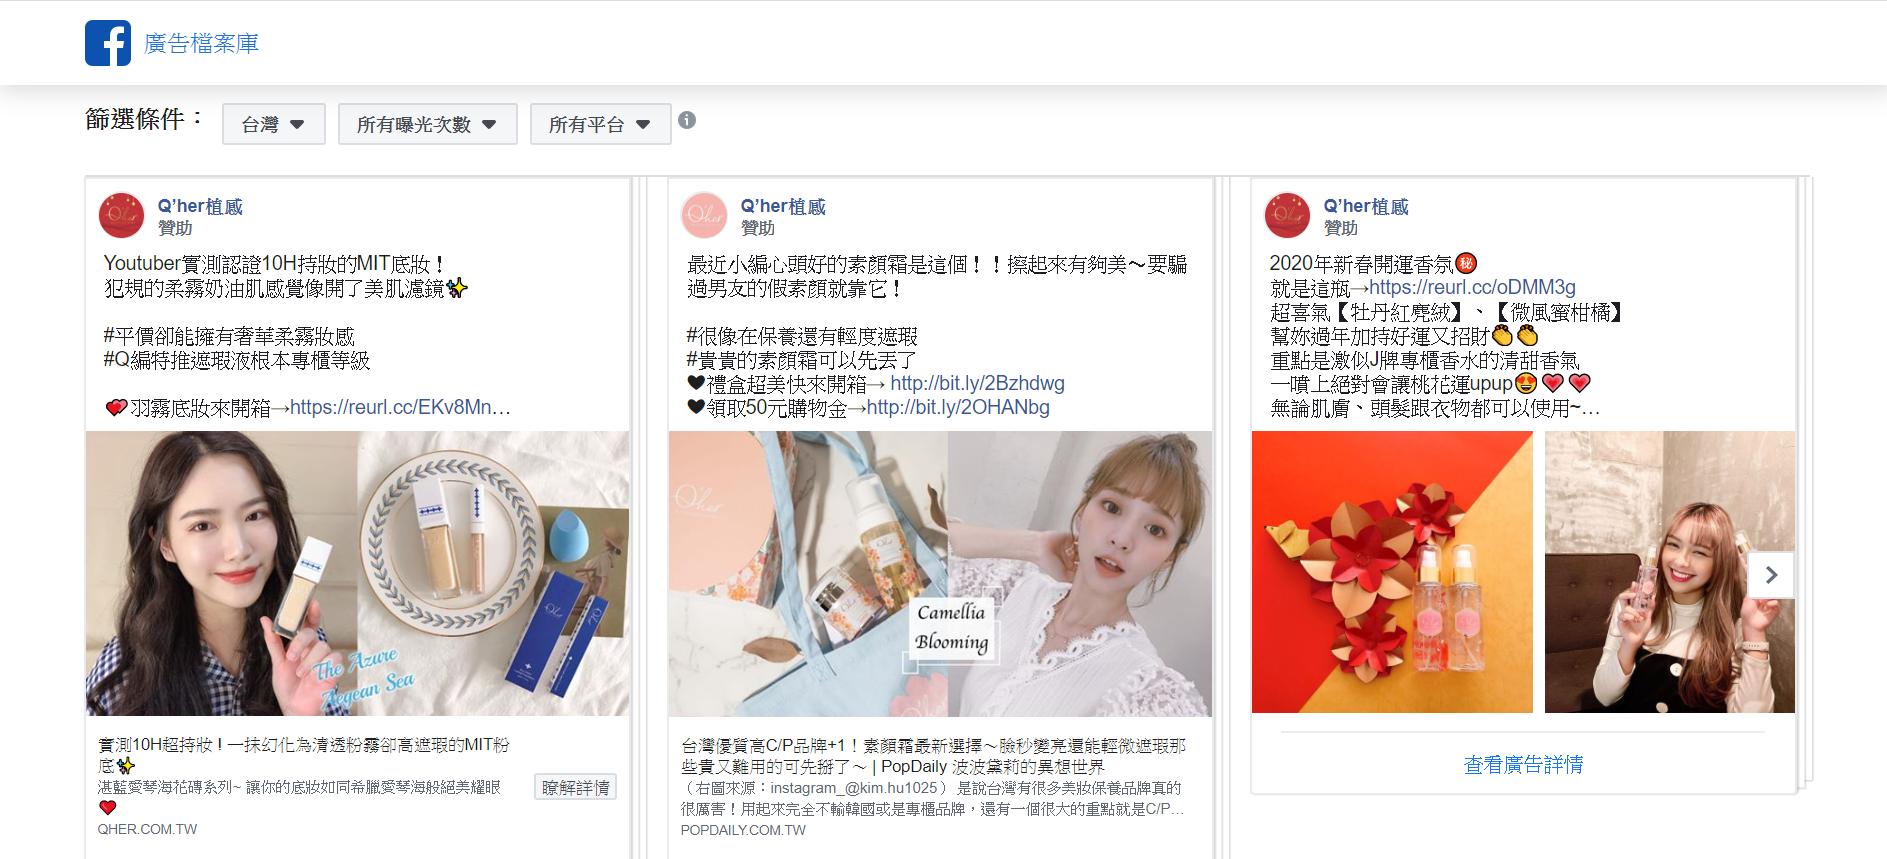 91APP 人氣店家 Q'her植感 臉書粉絲專頁